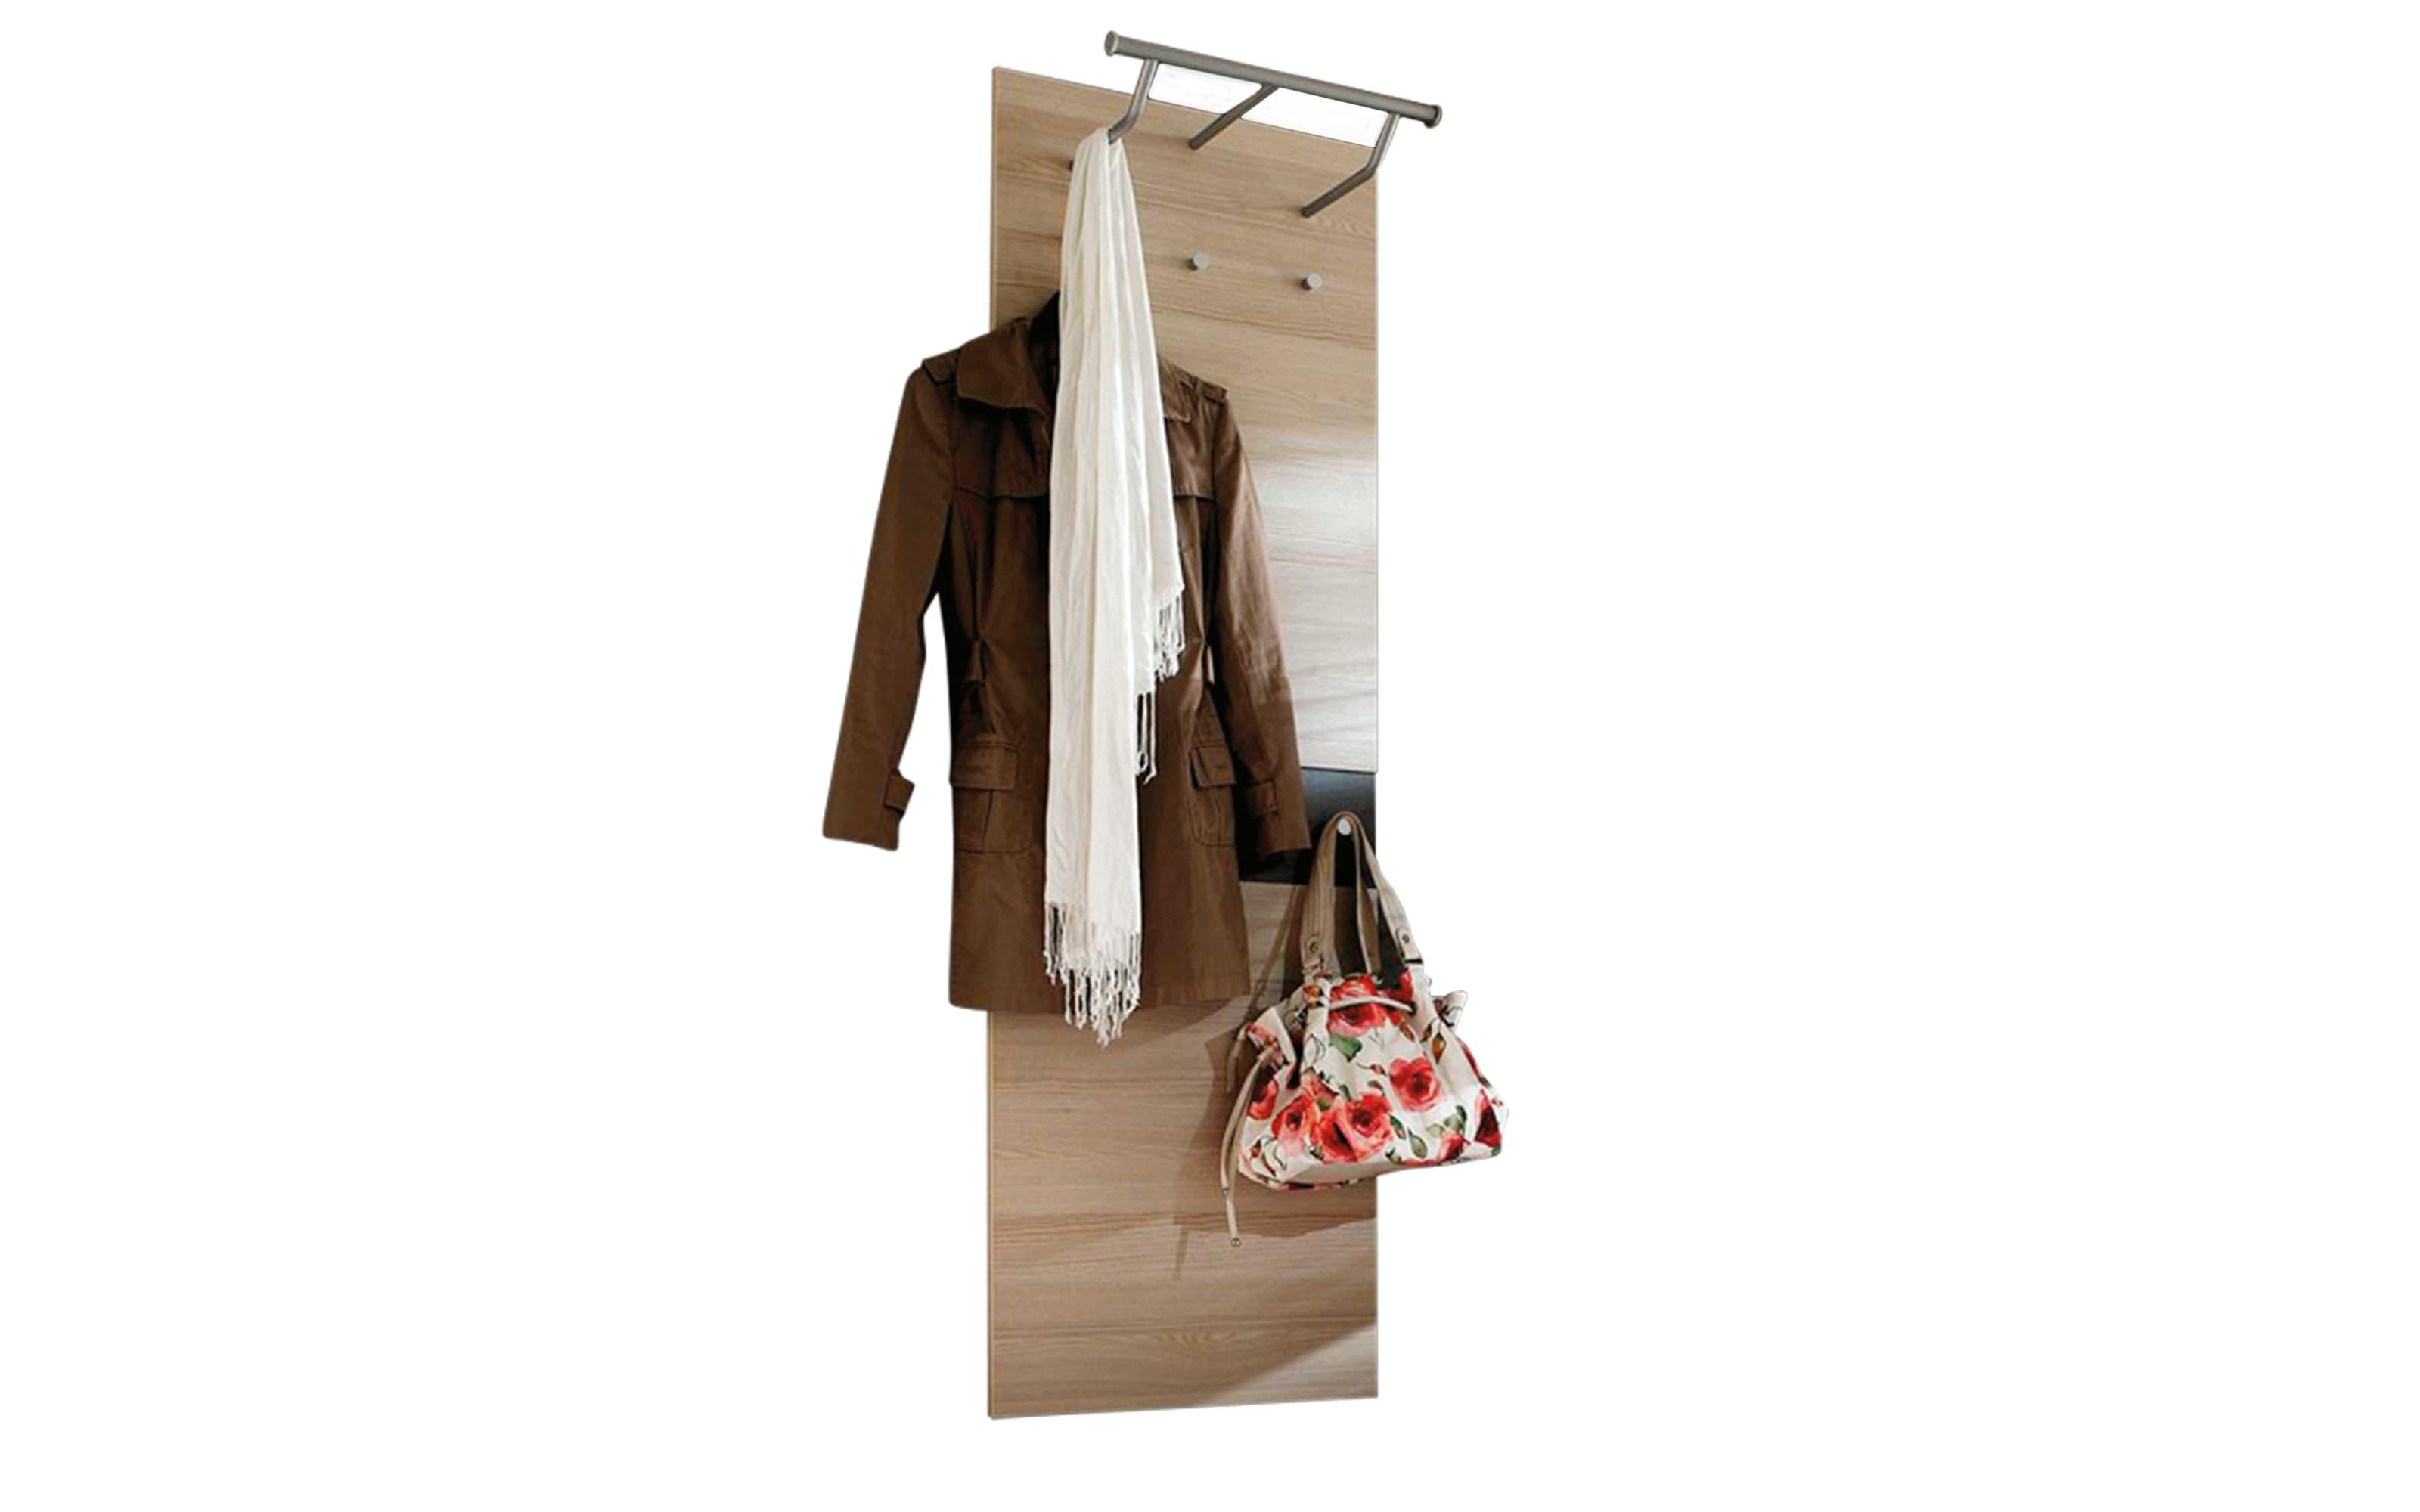 Garderobenpaneel Una in Bardolini Eiche-Nachbildung